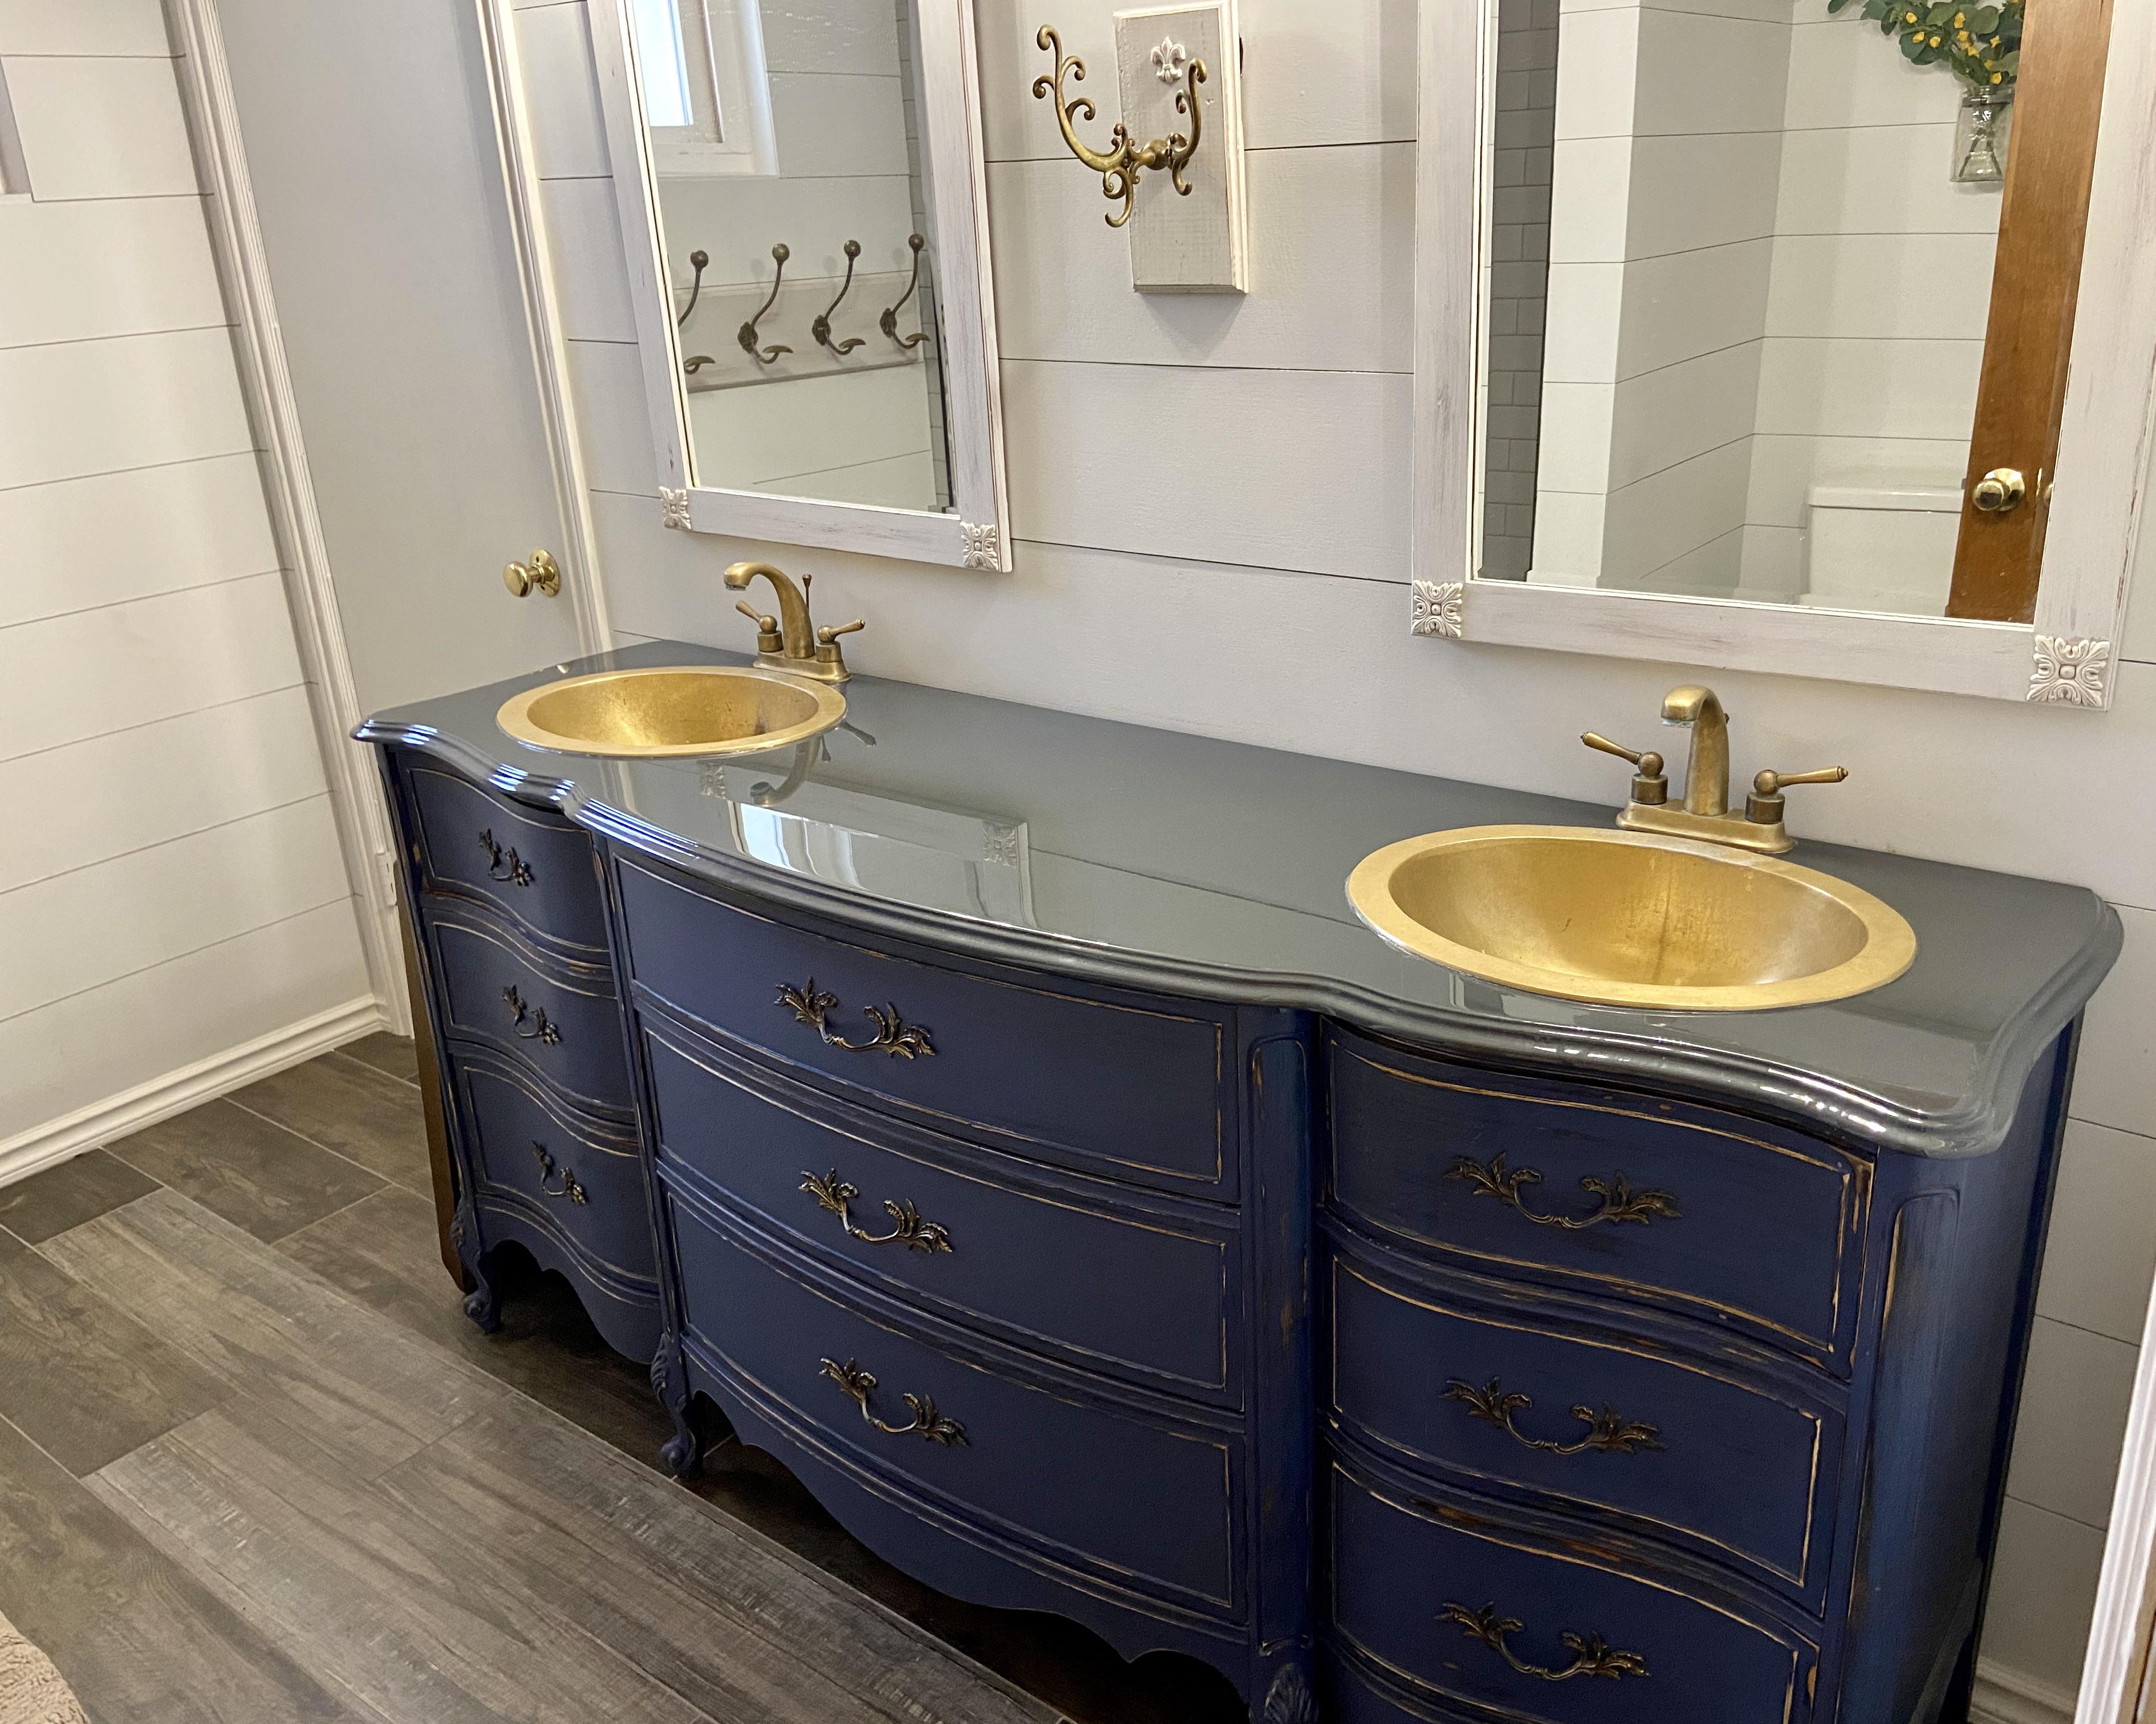 This Vintage Dresser That We Made Into A Bathroom Vanity Mildlyinteresting